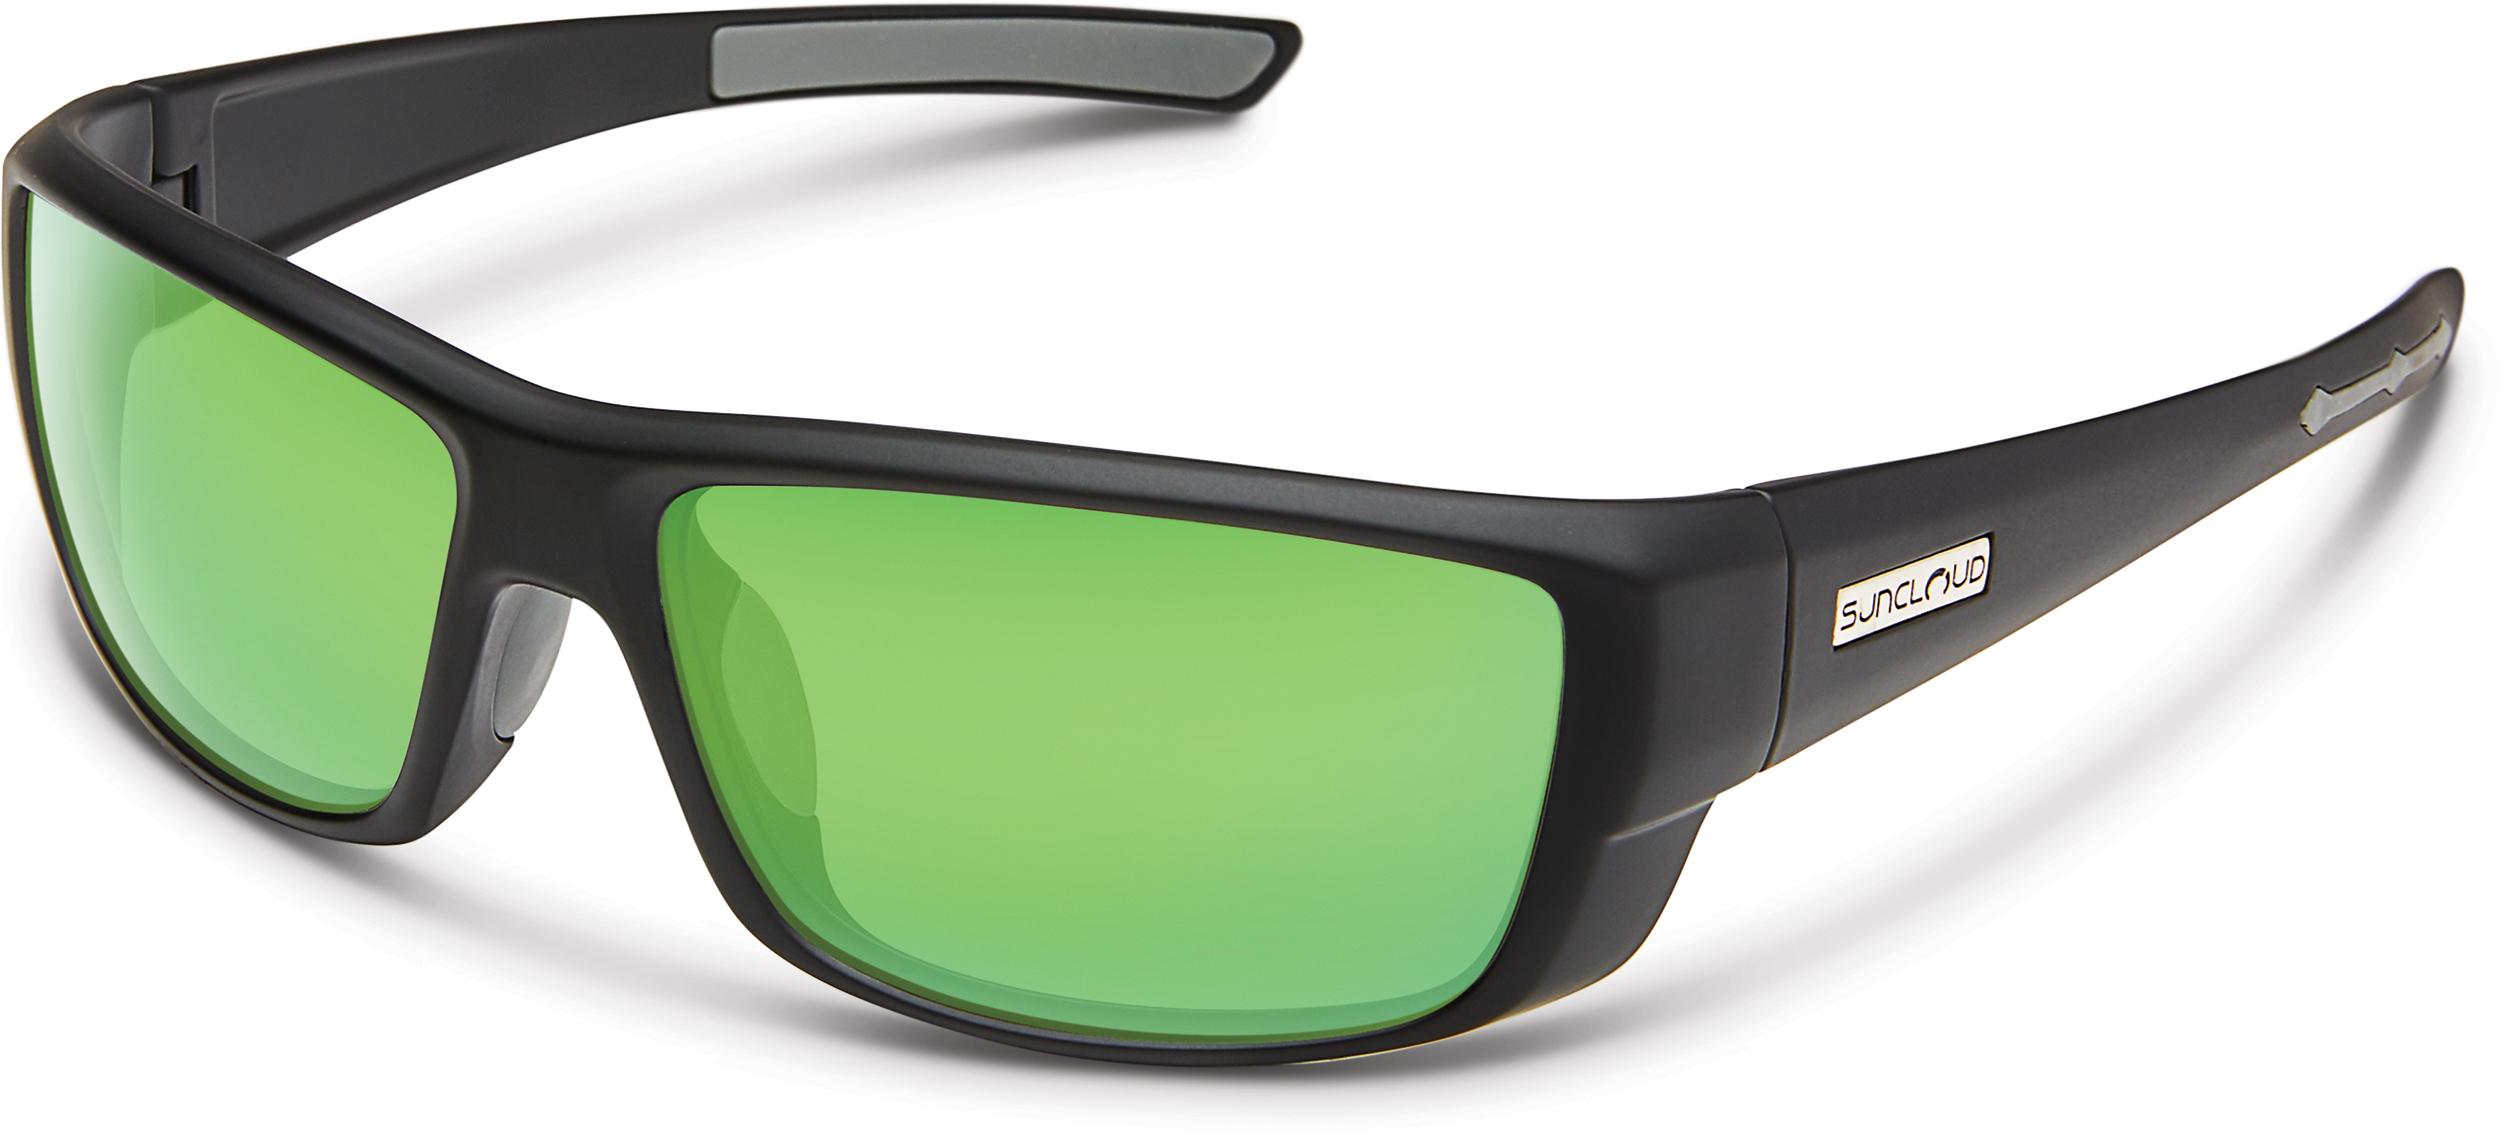 331920c58b4 Suncloud Lock Polarized Sunglasses - Unisex